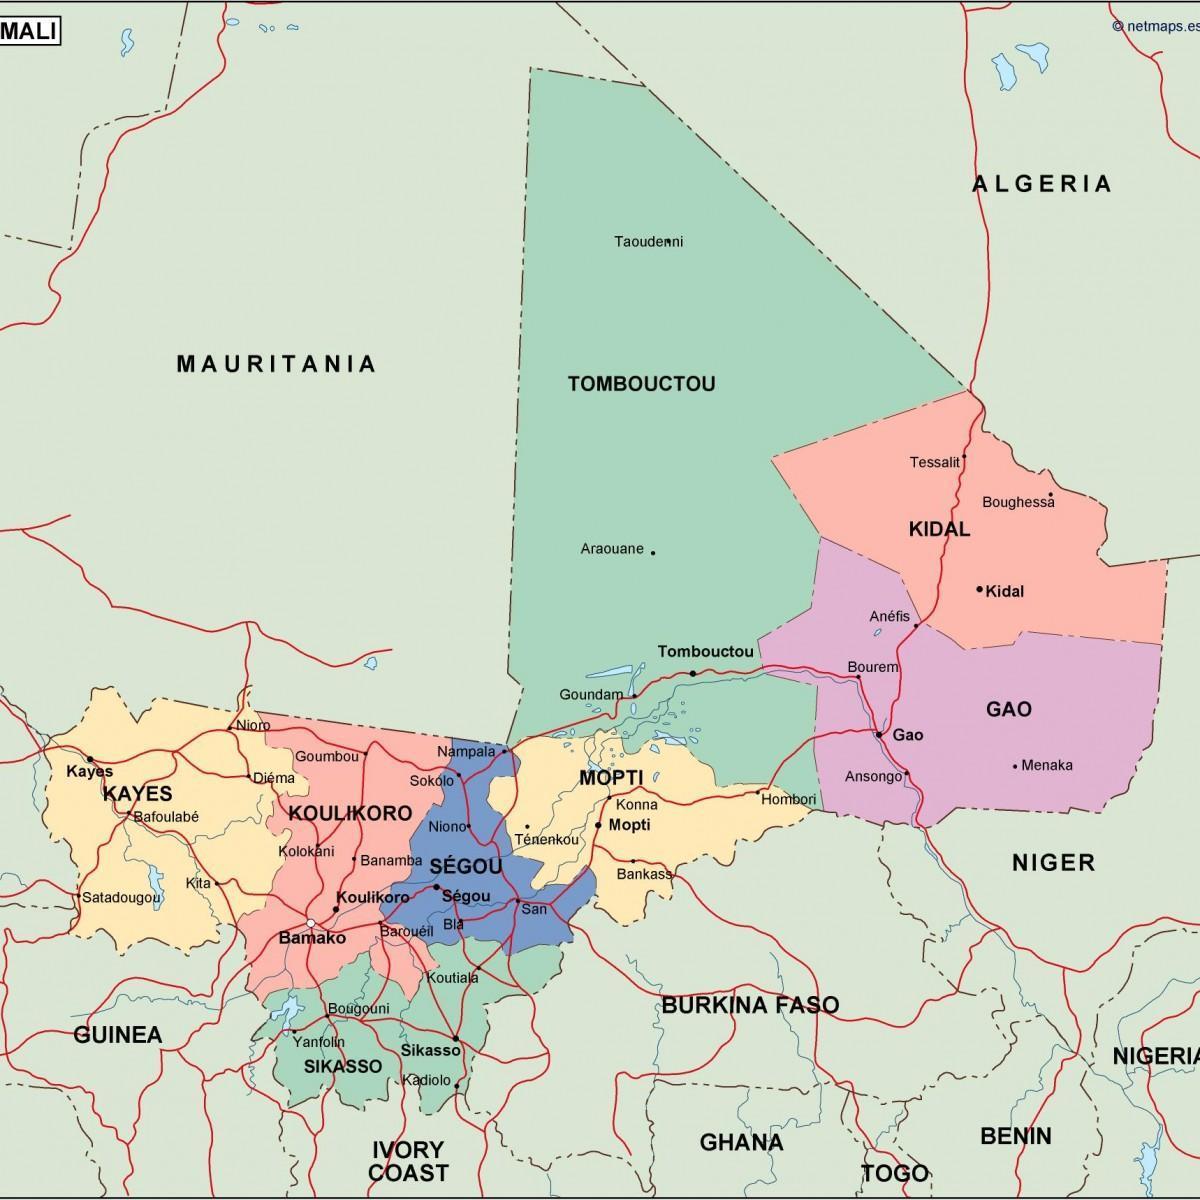 Politisk Karta Over Mali Karta Av Politiska Mali I Vastra Afrika